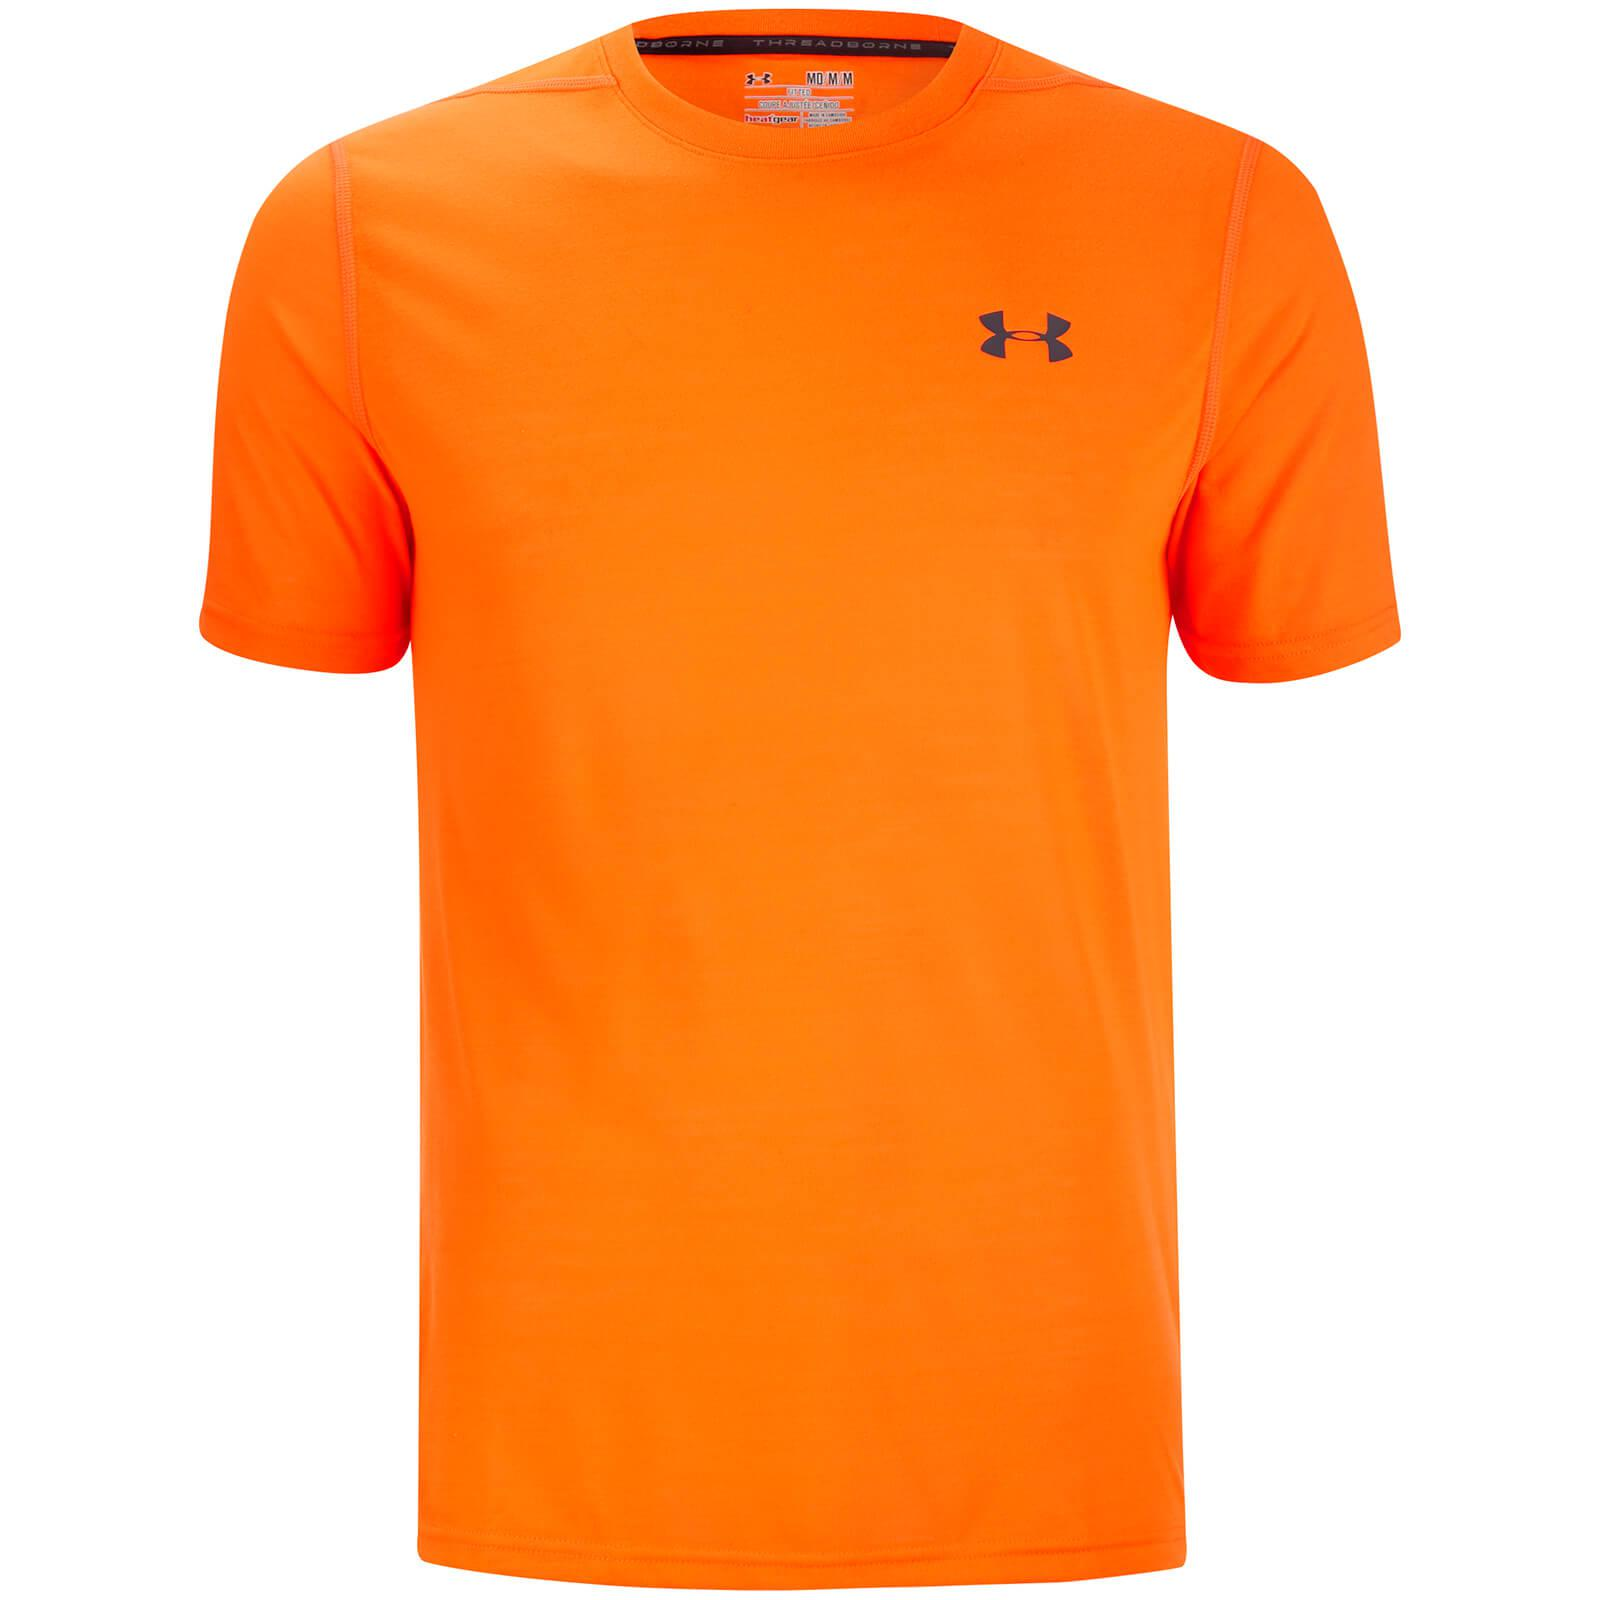 Lyst under armour threadborne fitted t shirt in orange for Under armour fitted t shirt